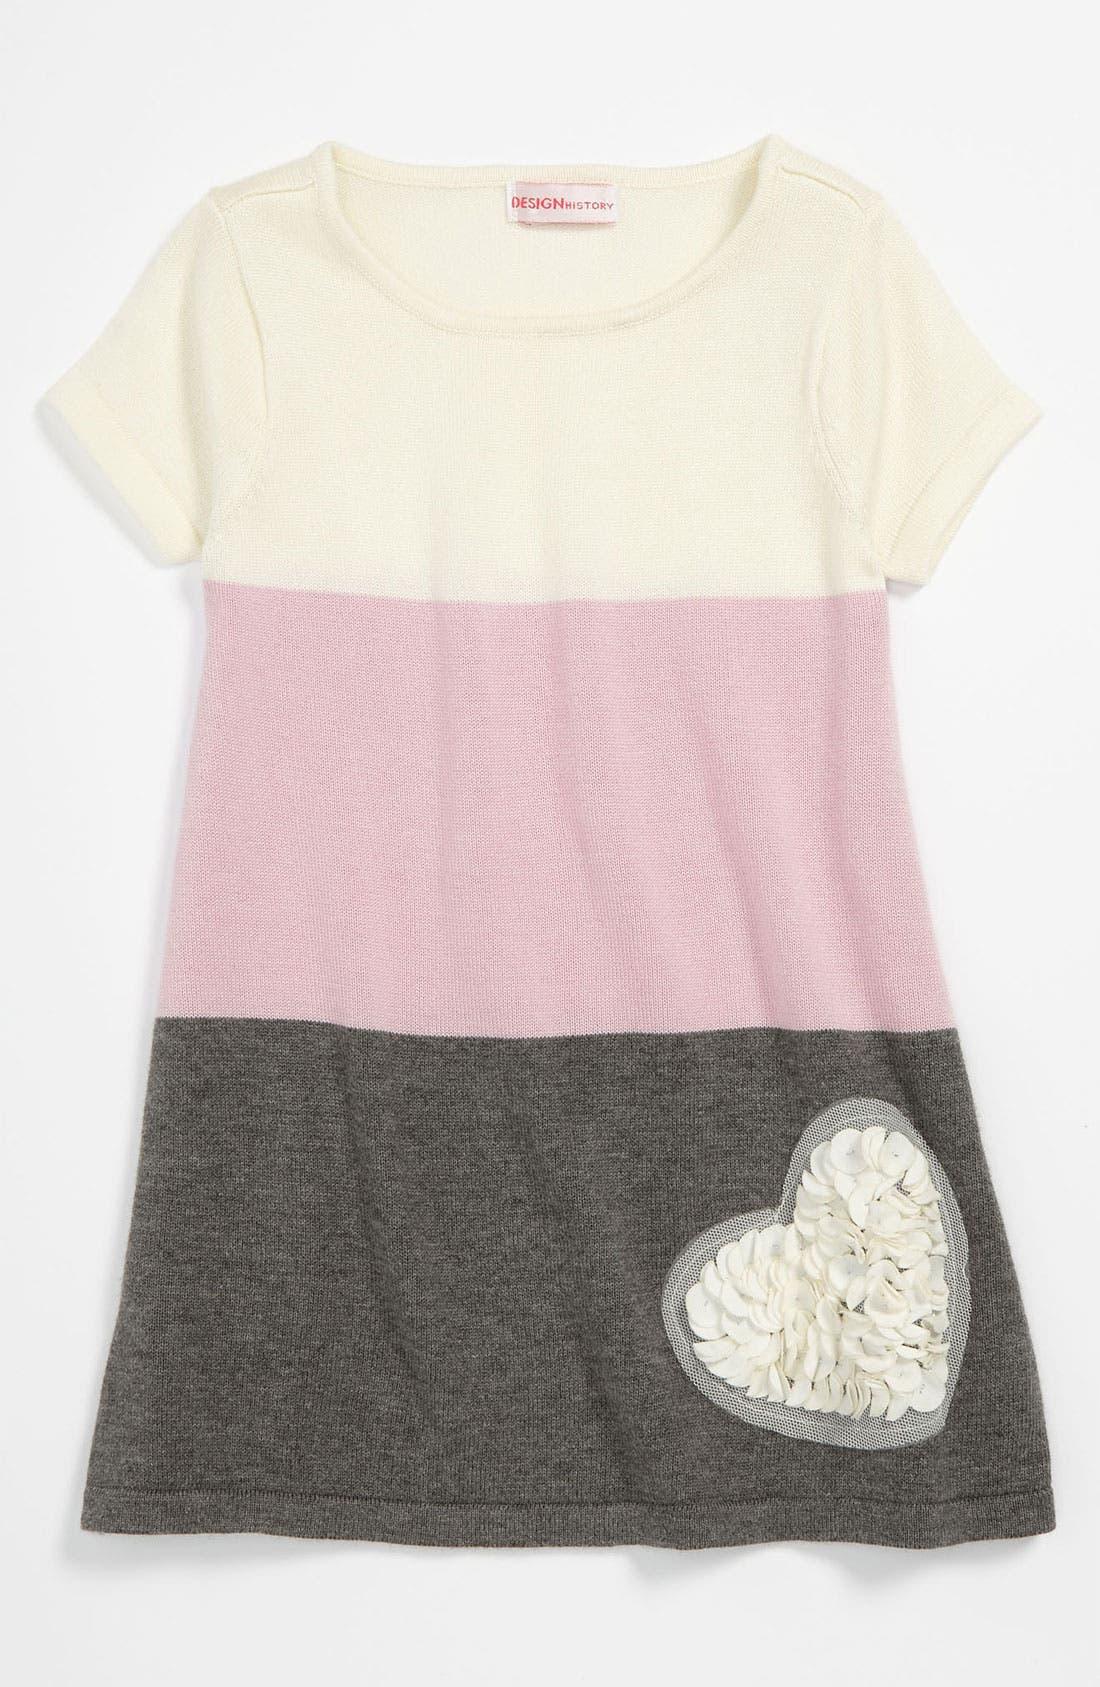 Main Image - Design History Sweater Dress (Toddler)